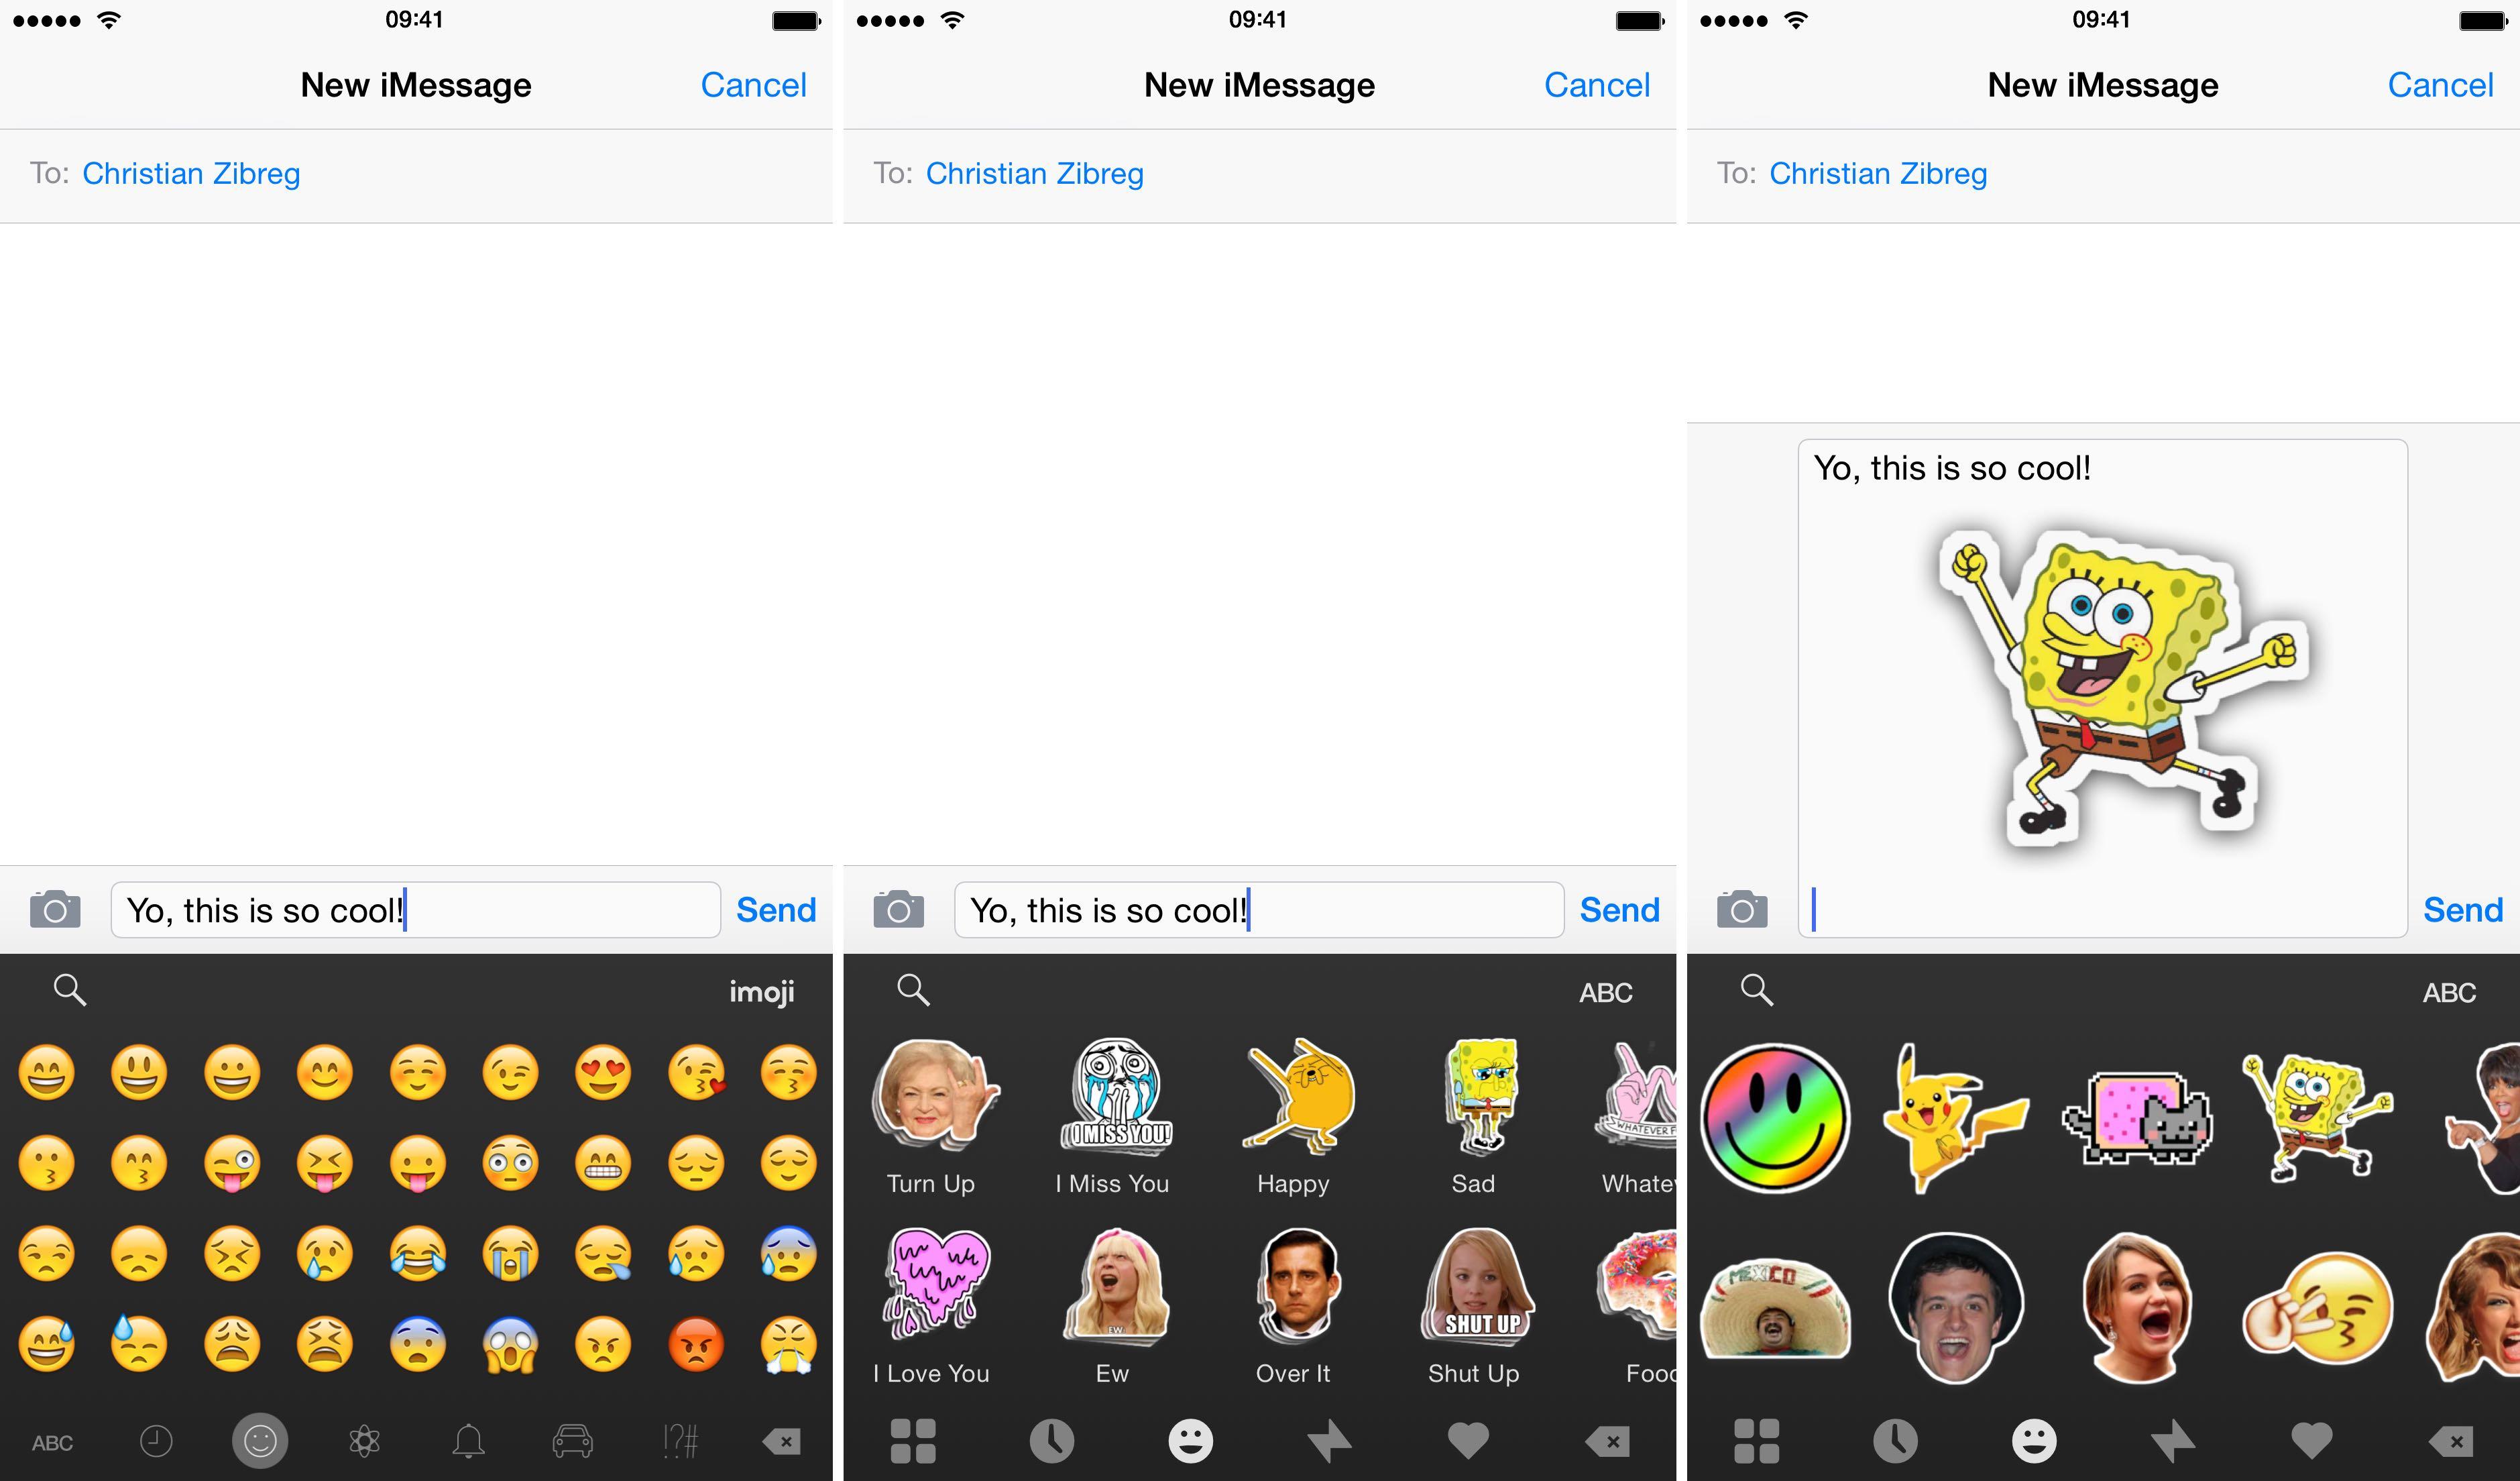 Fleksy Keyboard 5.7 for iOS Stickers iPhone screenshot 003